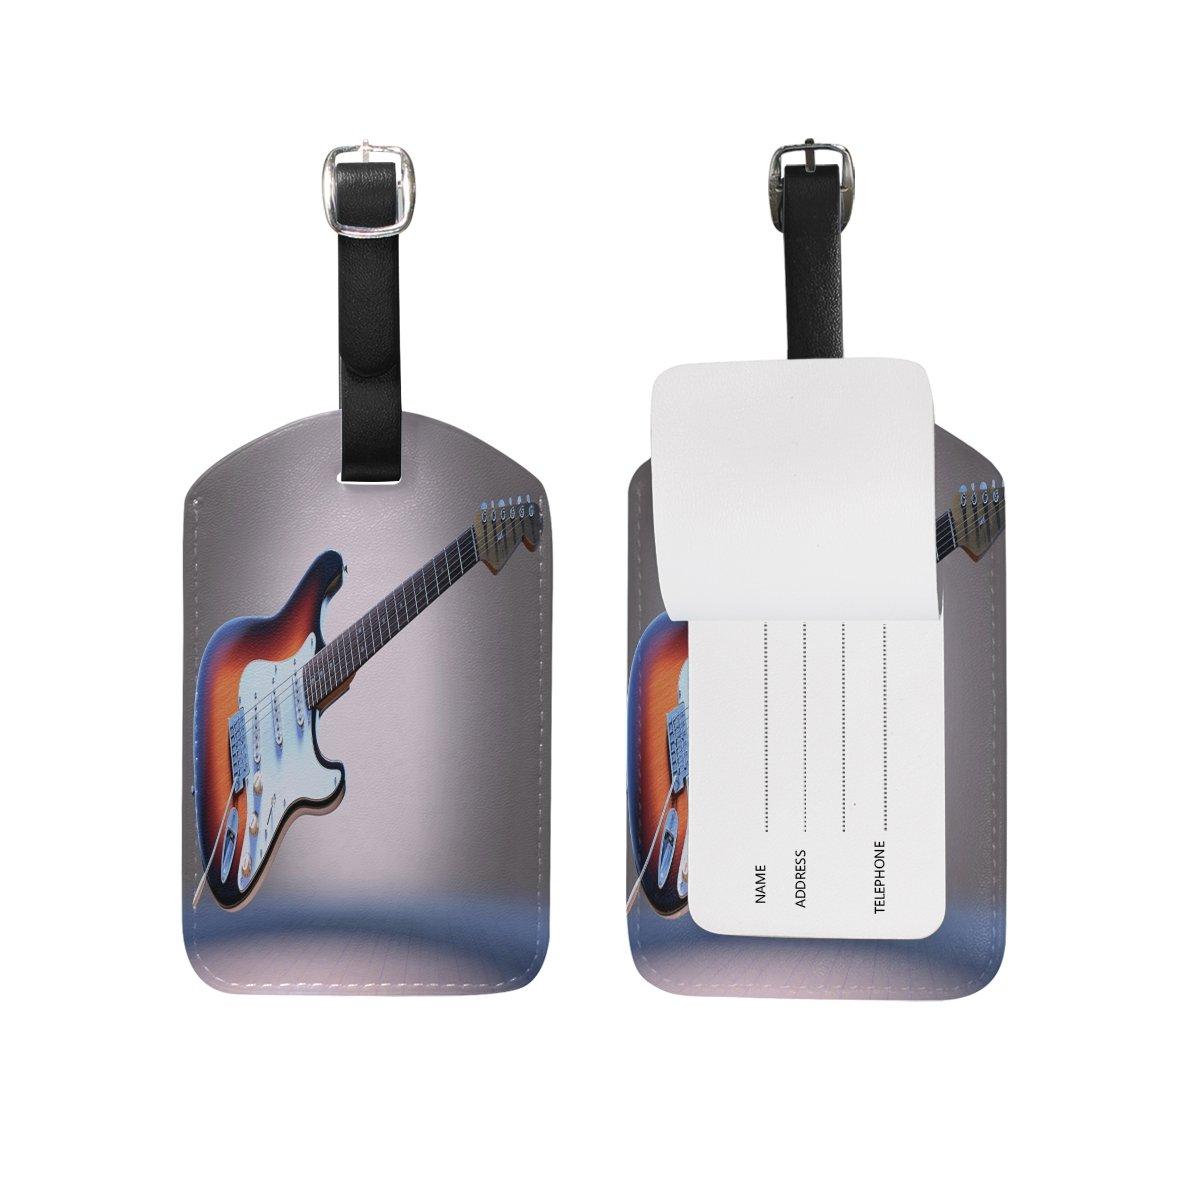 1Pcs Saobao Travel Luggage Tag Guitar PU Leather Baggage Suitcase Travel ID Bag Tag